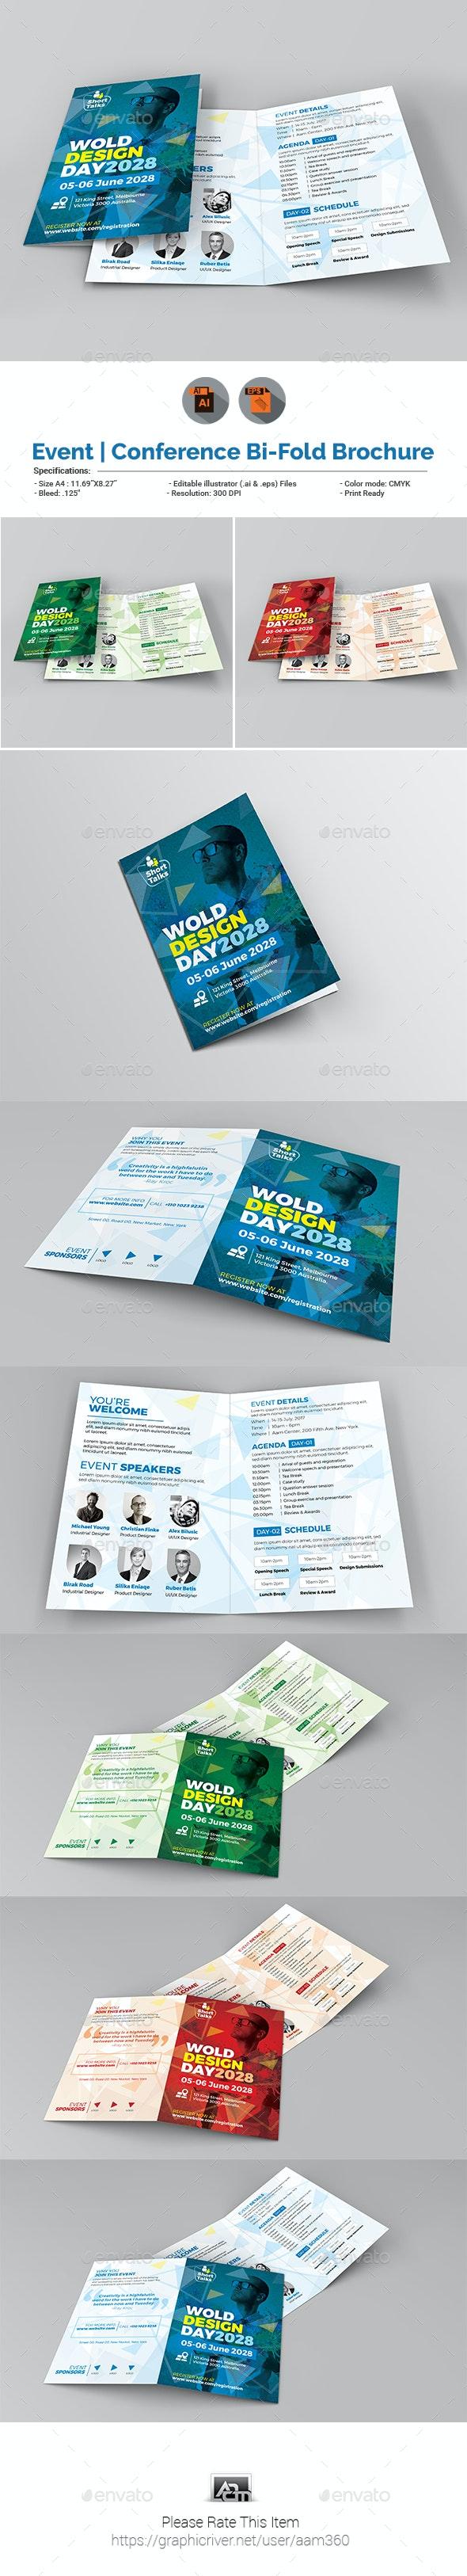 Conference Bifold Brochure Template - Corporate Brochures